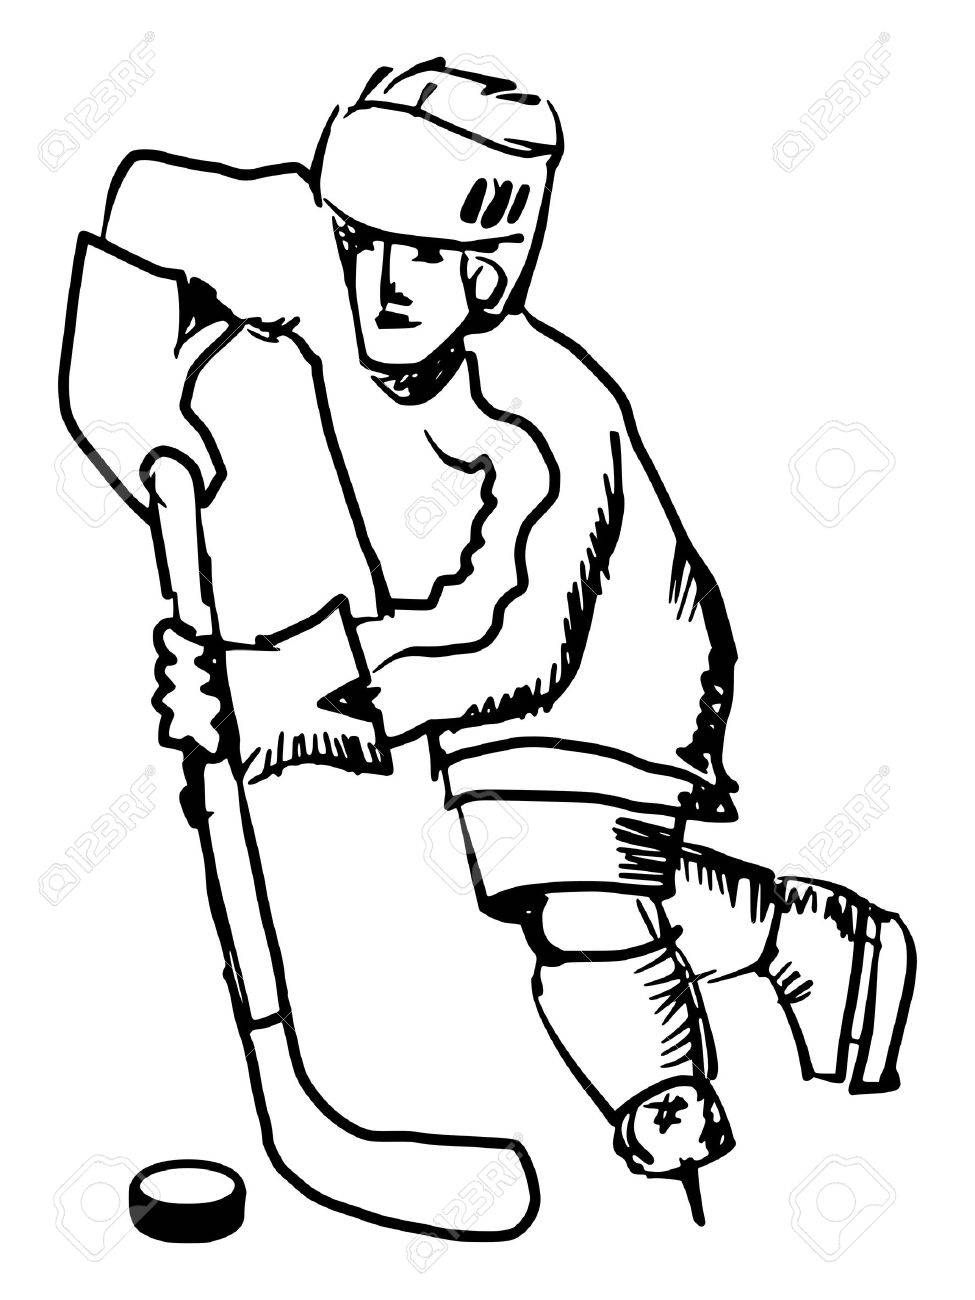 975x1300 Hand Drawn, Sketch Illustration Of Hockey Player Royalty Free